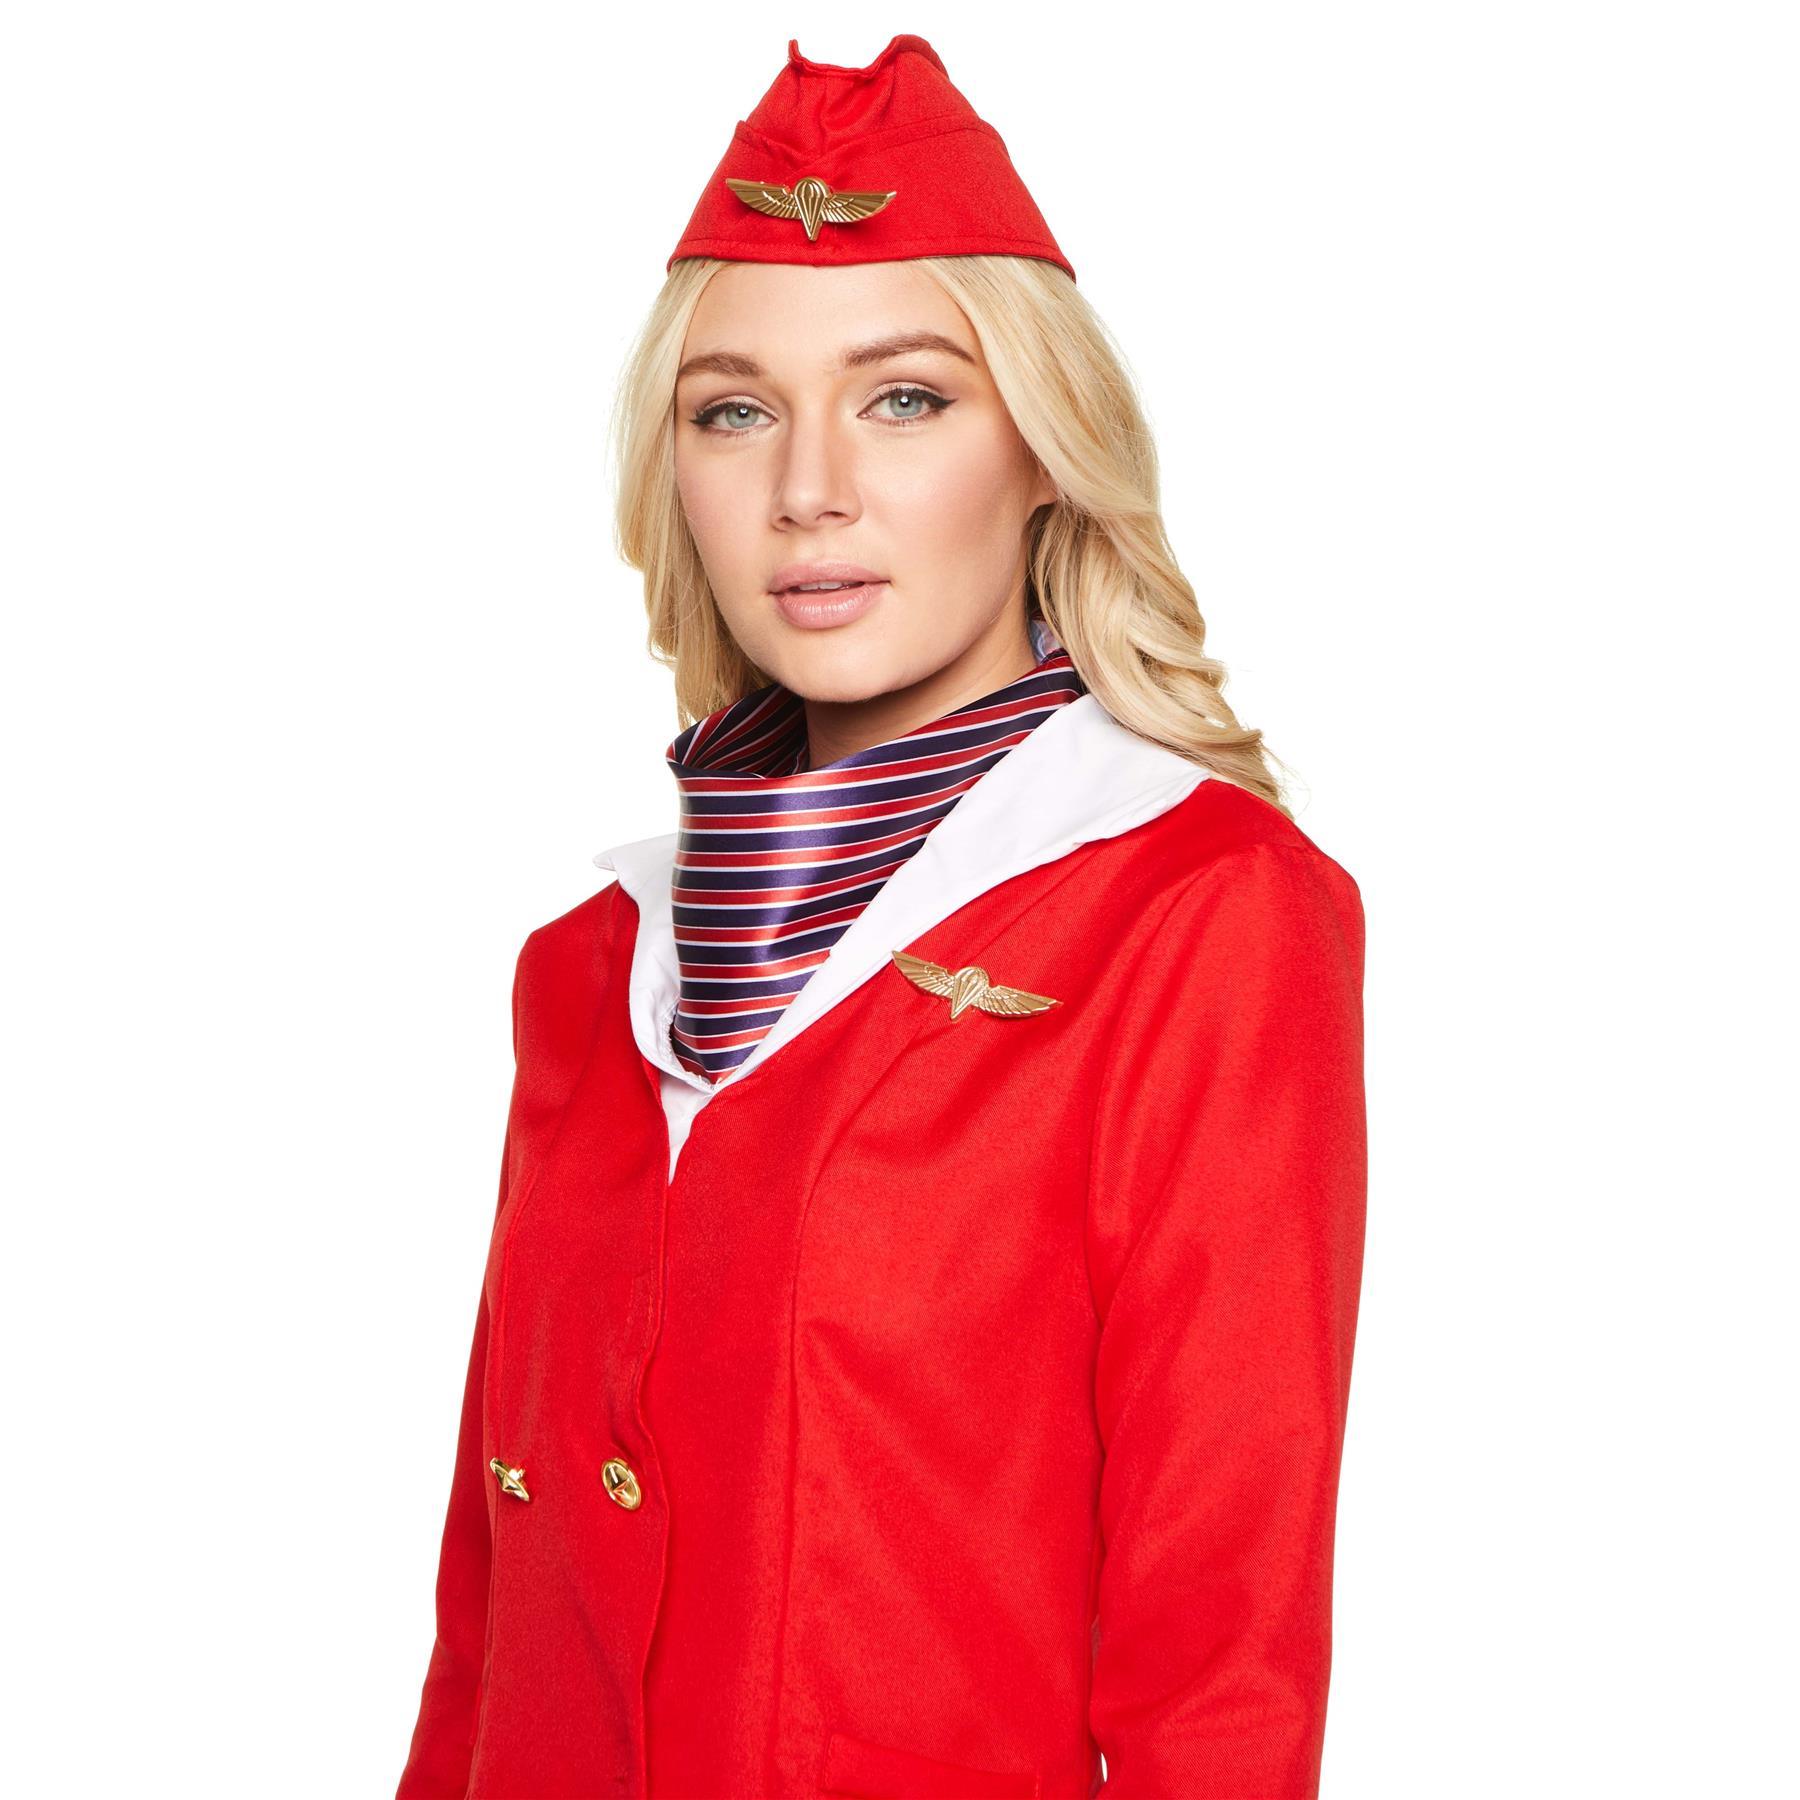 Womens-Flight-Attendant-Costumes-Air-Stewardess-Hostess-Fancy-Dress-Outfit thumbnail 4